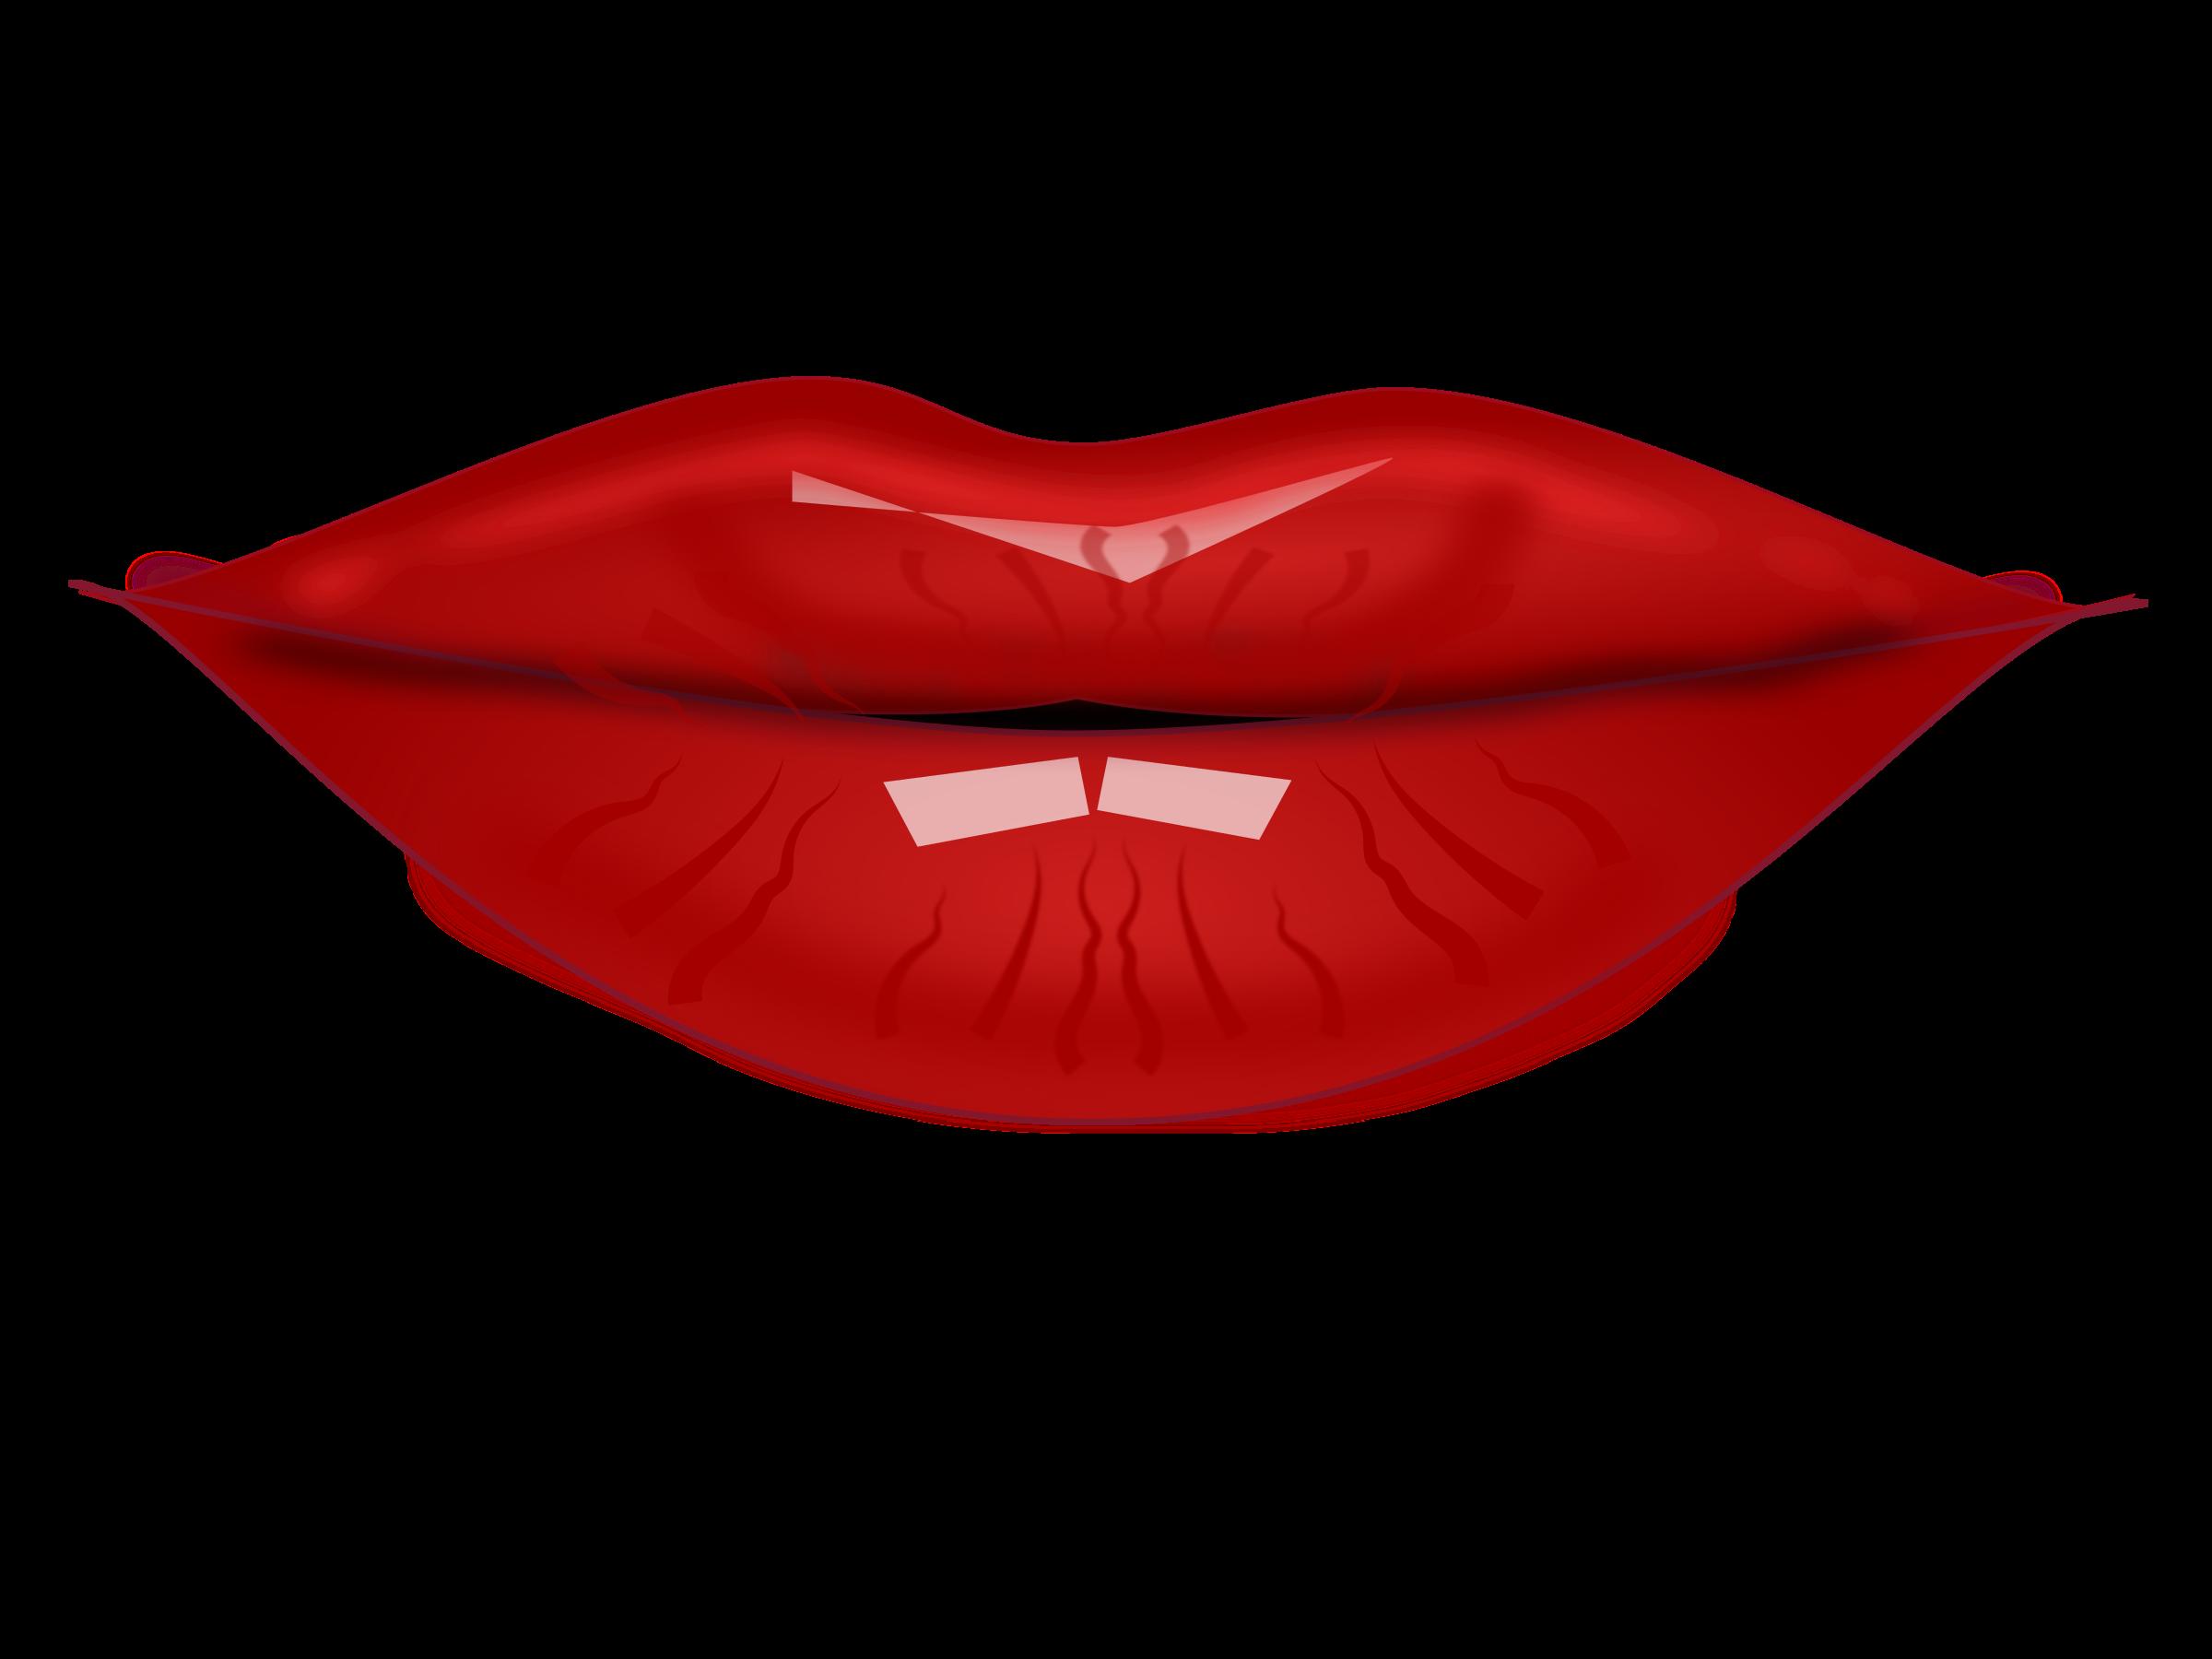 Clipart lips by netalloy-Clipart lips by netalloy-4